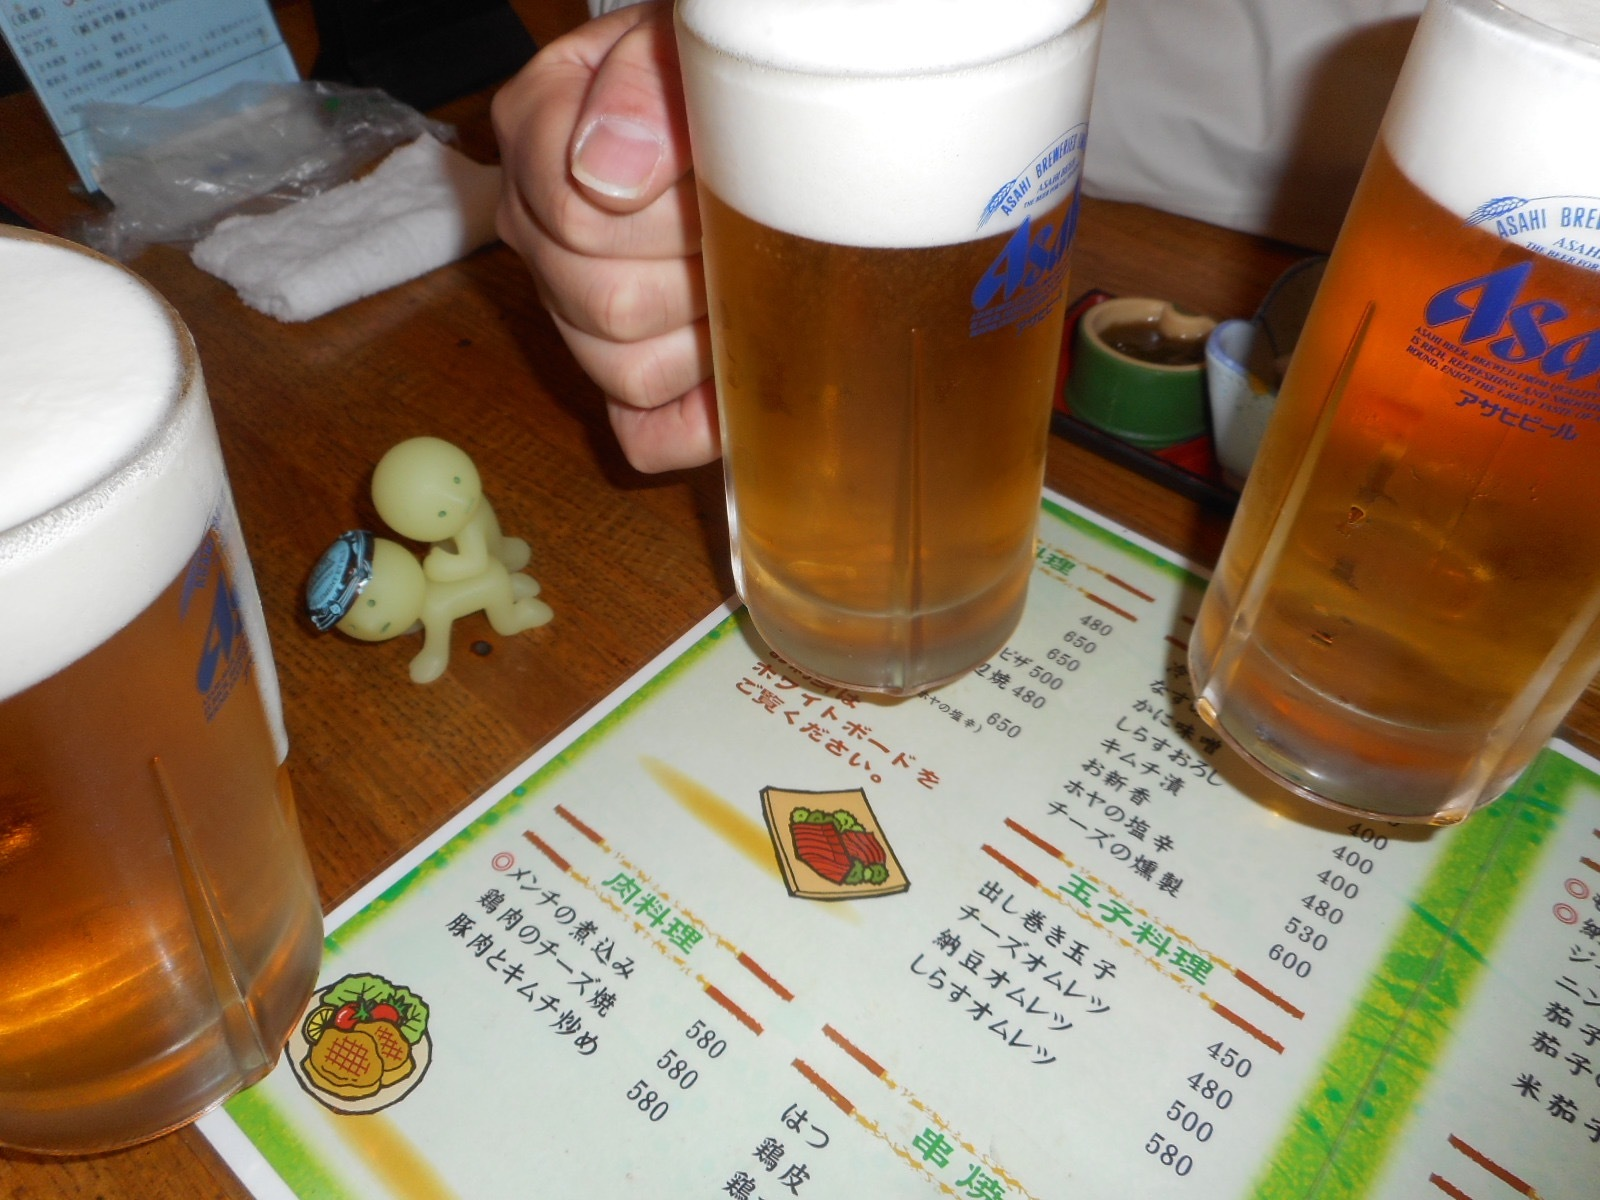 shinomine_jundai_omachi_sannen25by2_0.jpg